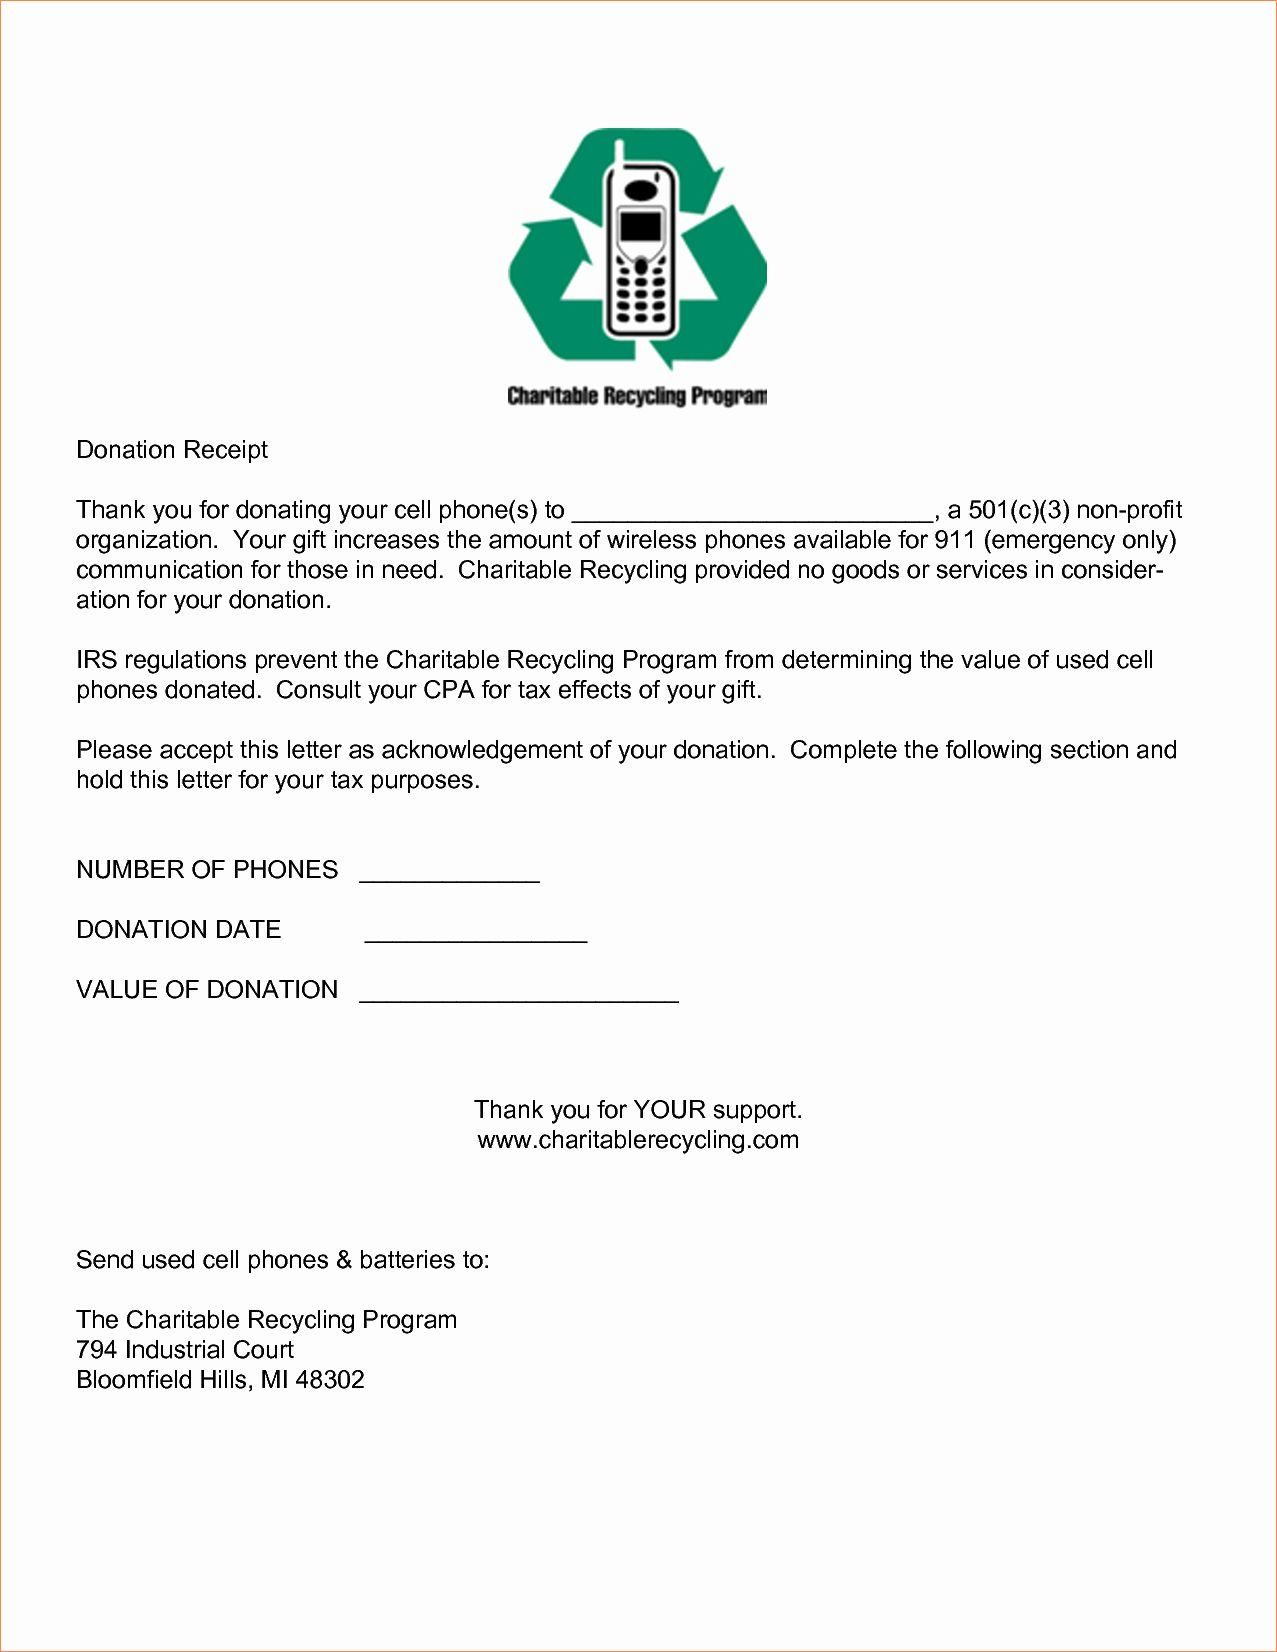 Donation Receipt Letter Template Inspirational 5 Sample Donation Receipt Doctors Note Template Letter Templates Receipt Template